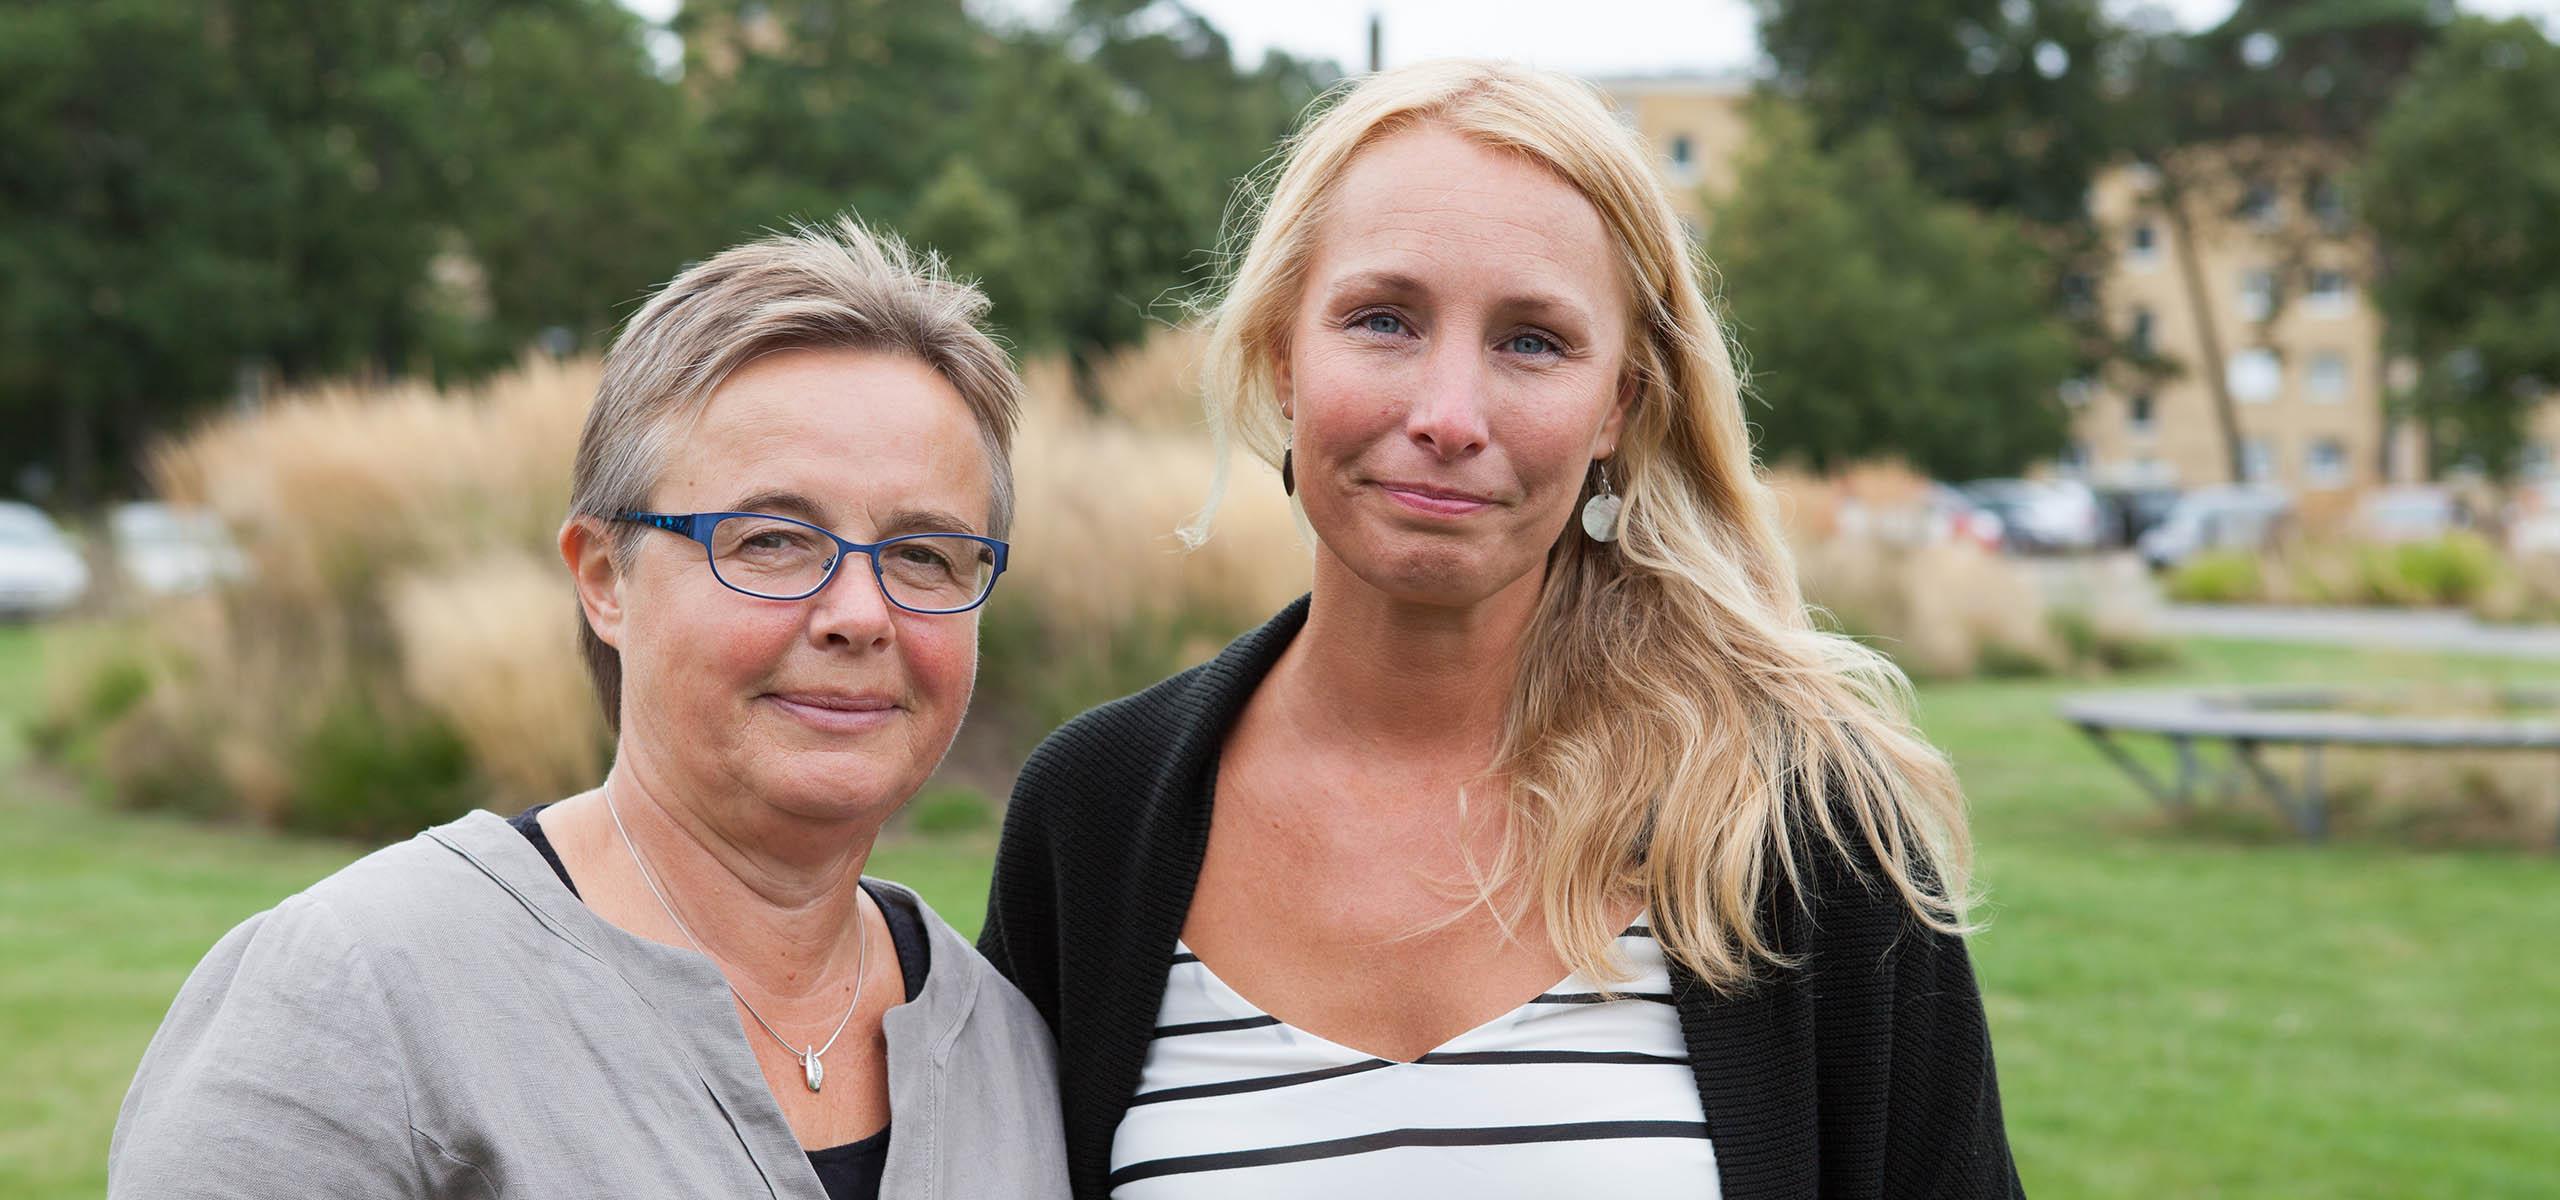 Anna Holmgren Studentsjuksköterska BTH, Mariana Sahlström Studentkurator BTH